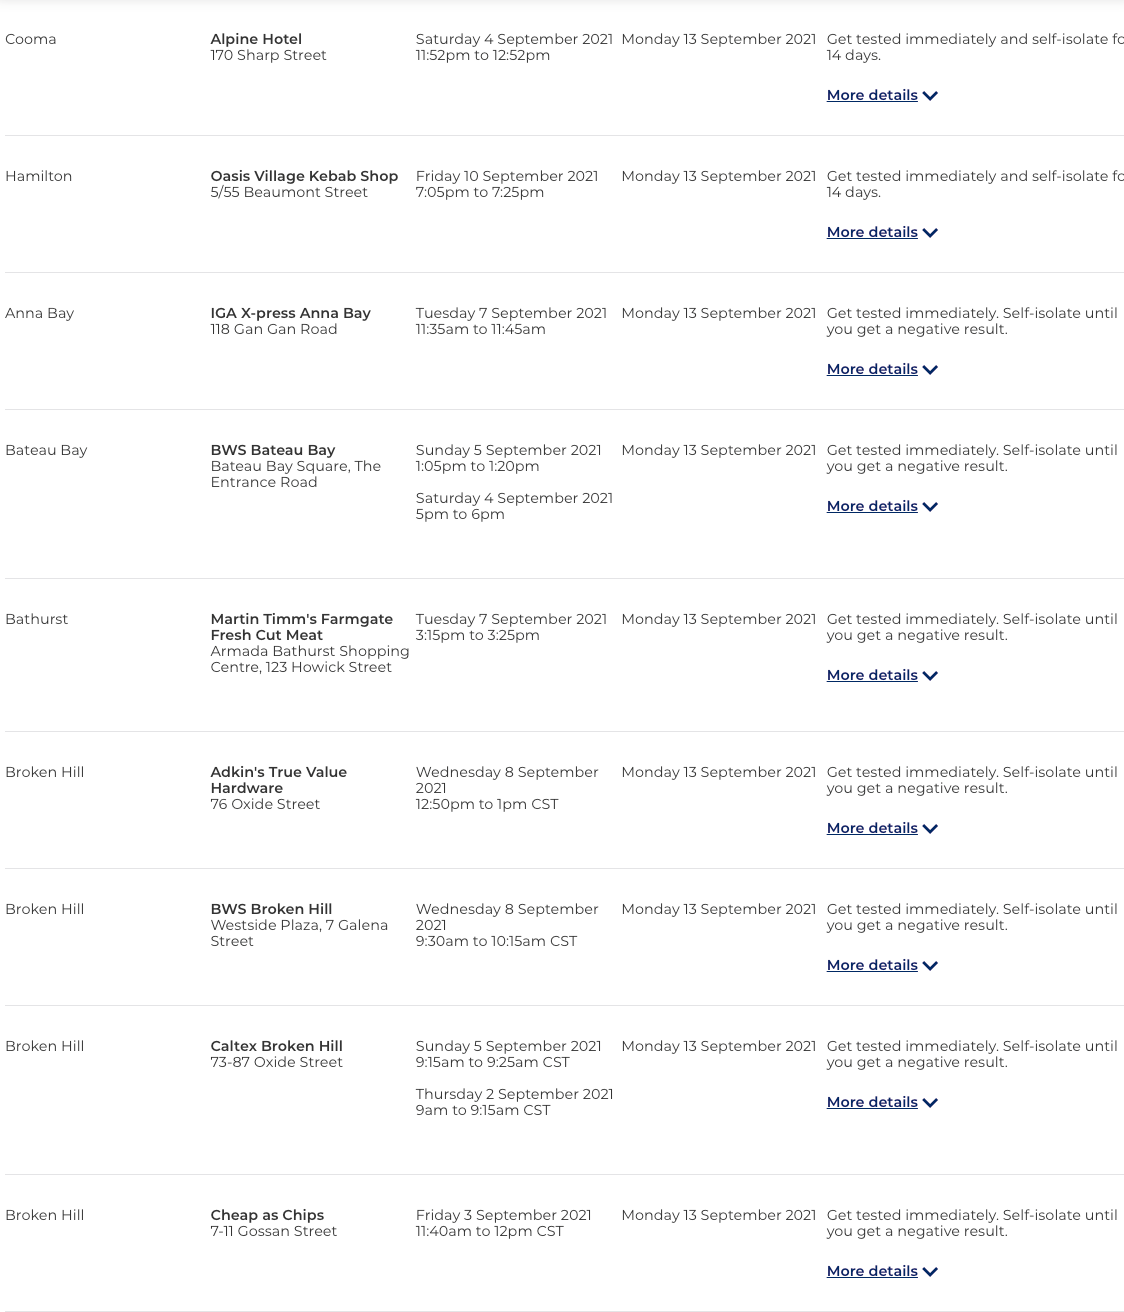 www.nsw.gov.au_covid-19_nsw-covid-19-case-locations_case-locations (31)的副本.png